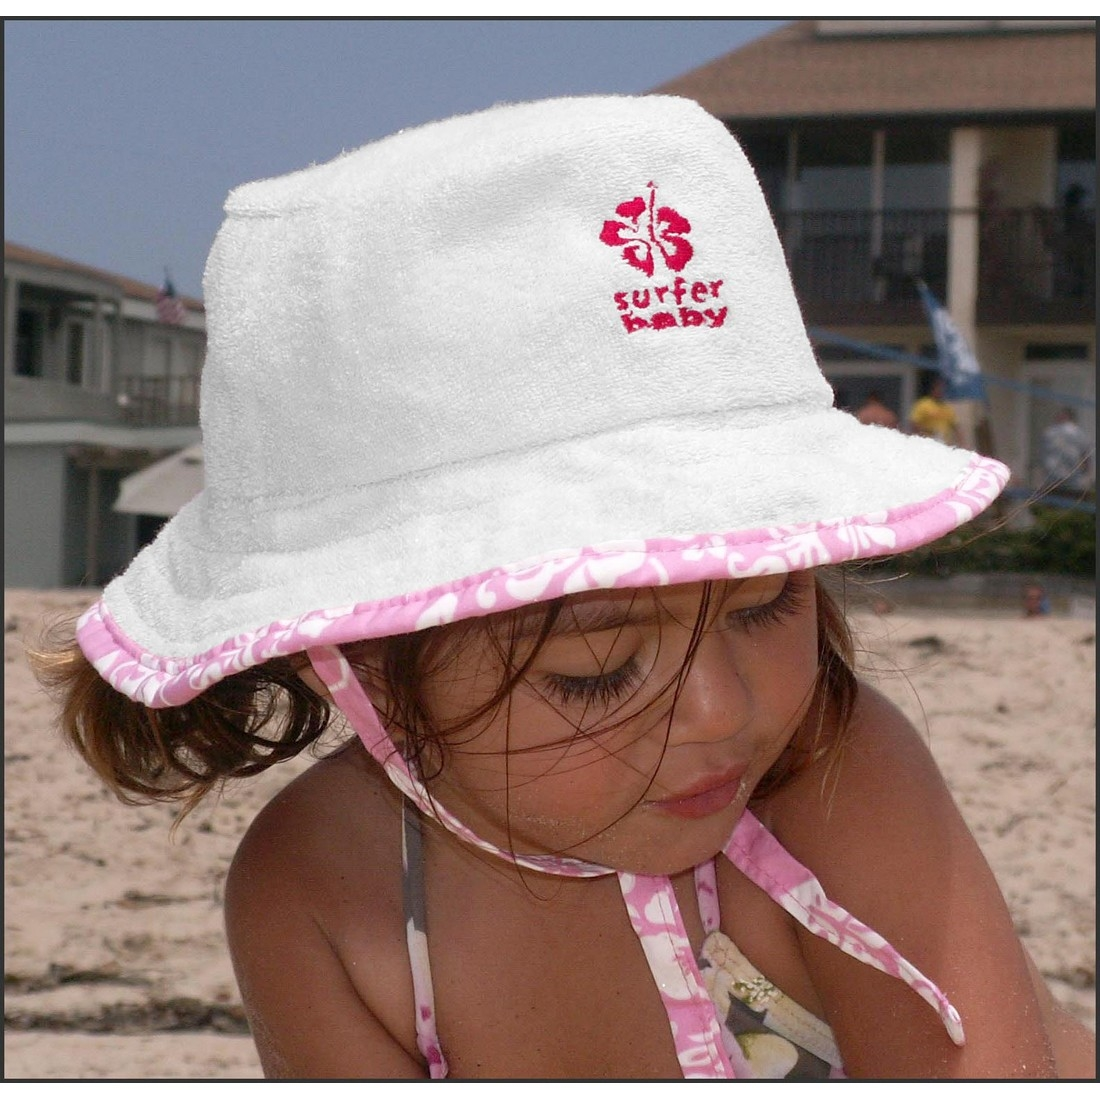 654425fb7f3 Surfer Baby Cotton Terry Floppy Sun Hat with Hawaiian Trim